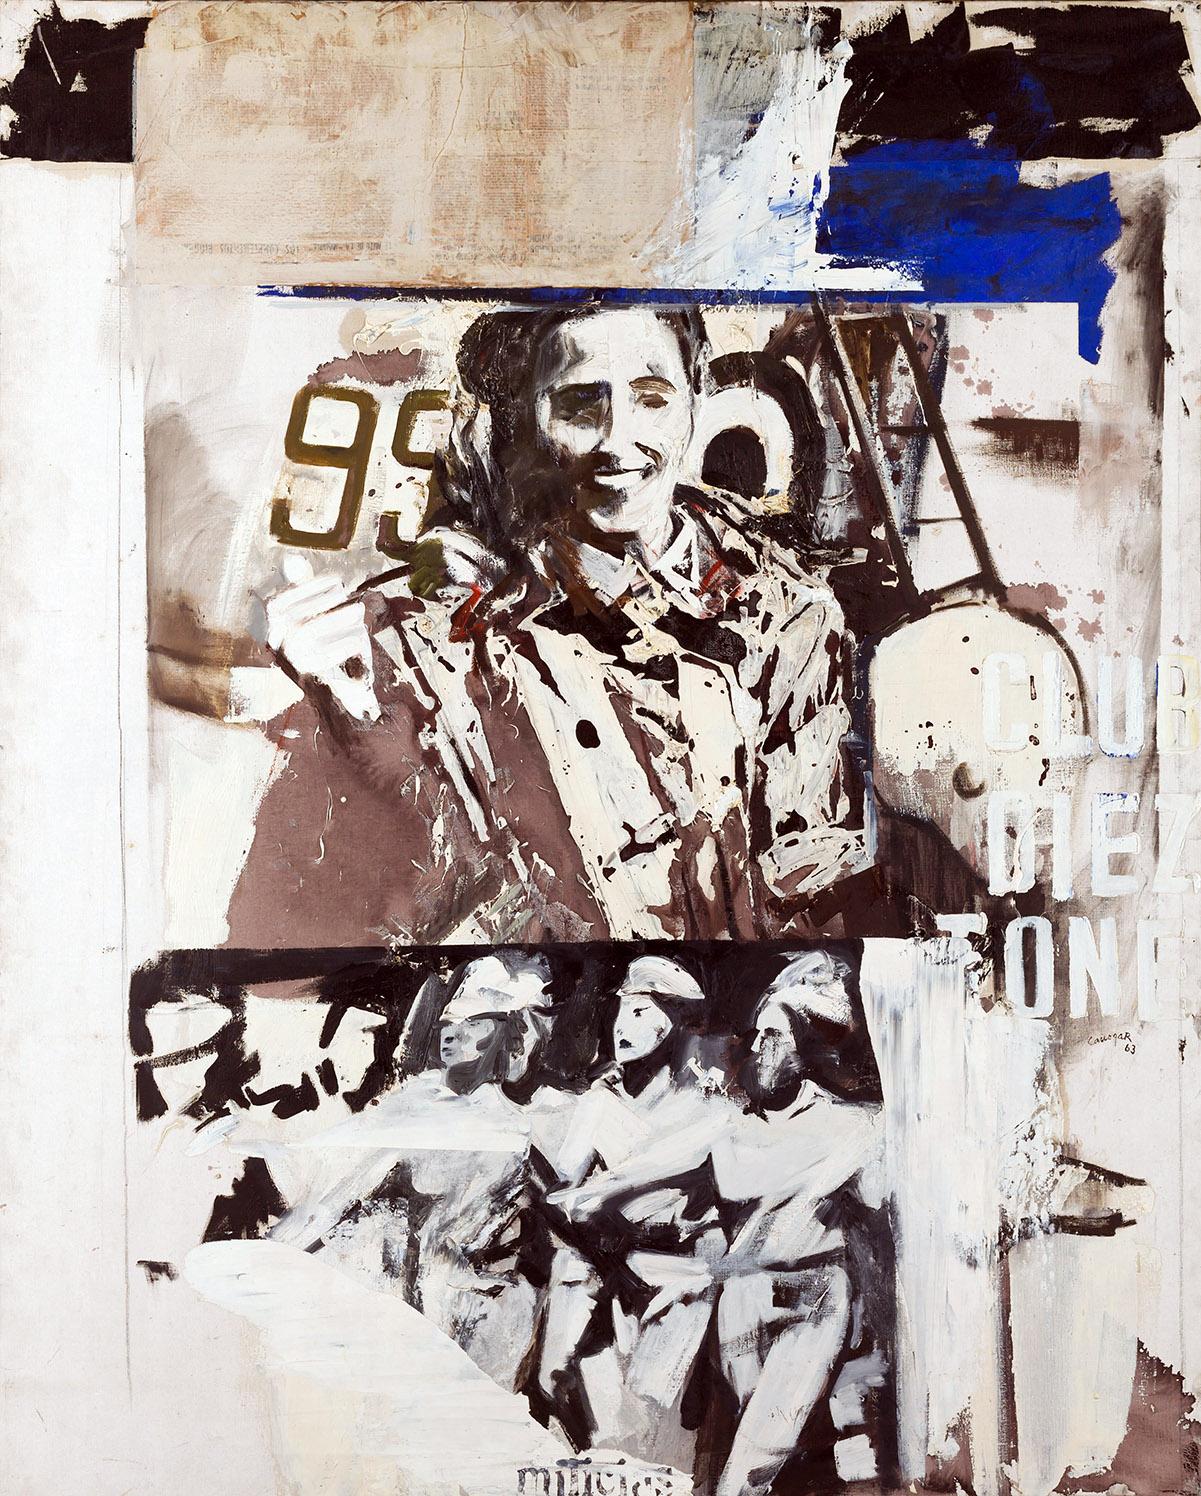 Rafael-Canogar-Reina-en-la-region-vacia-1963